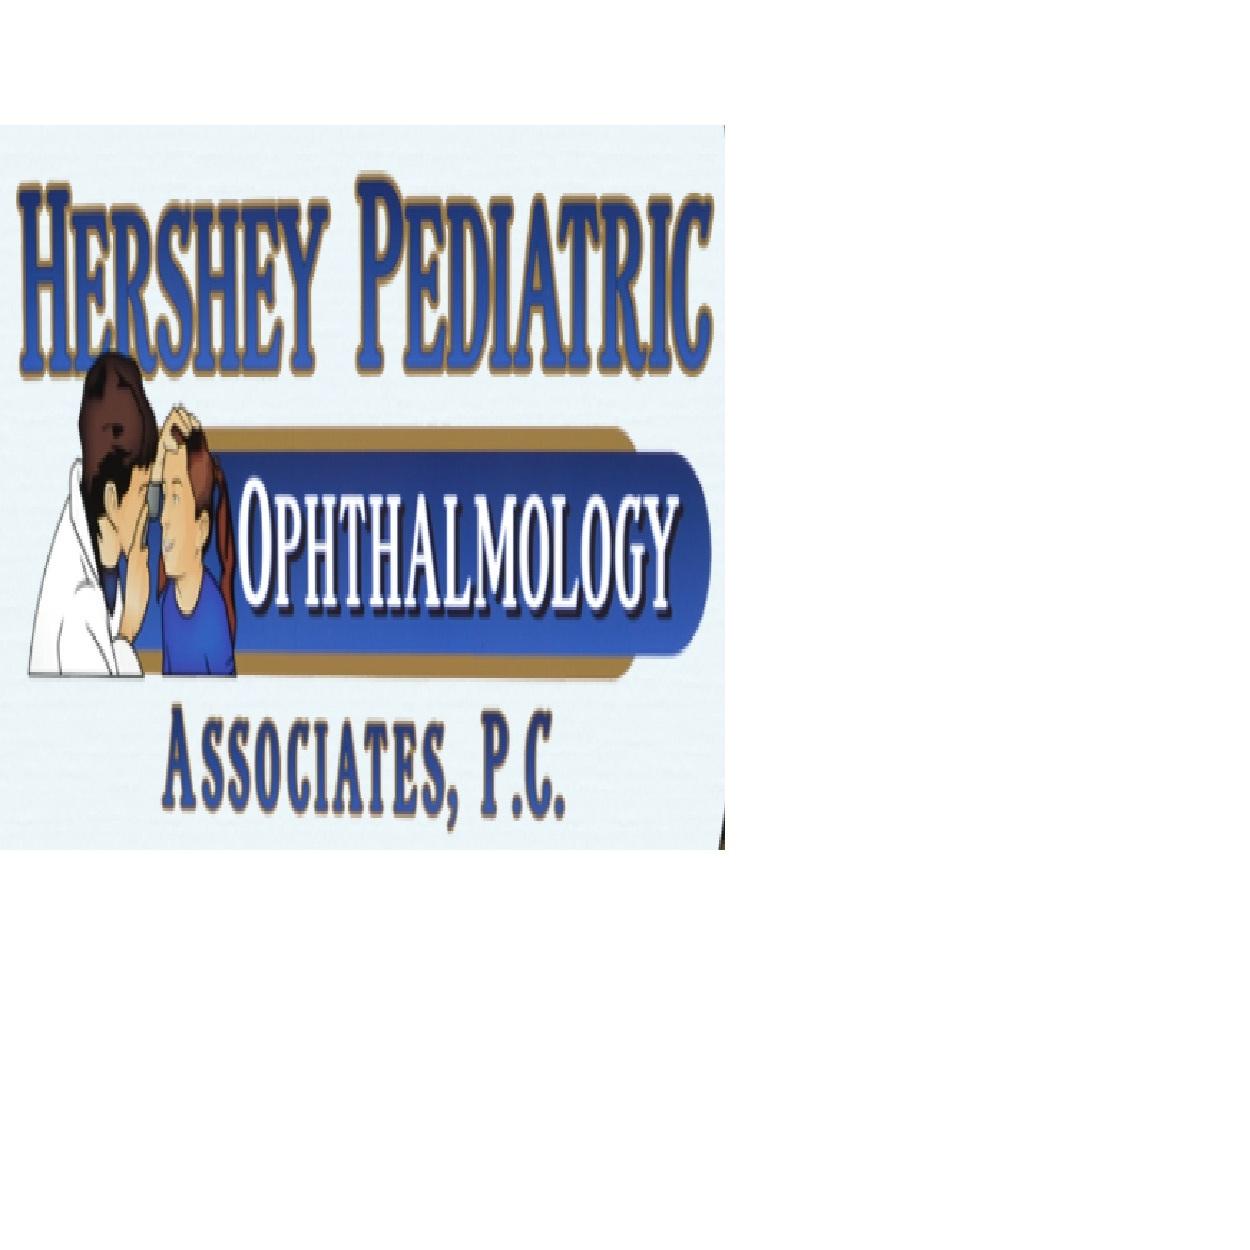 Hershey Pediatric Ophthalmology:  James McManaway MD